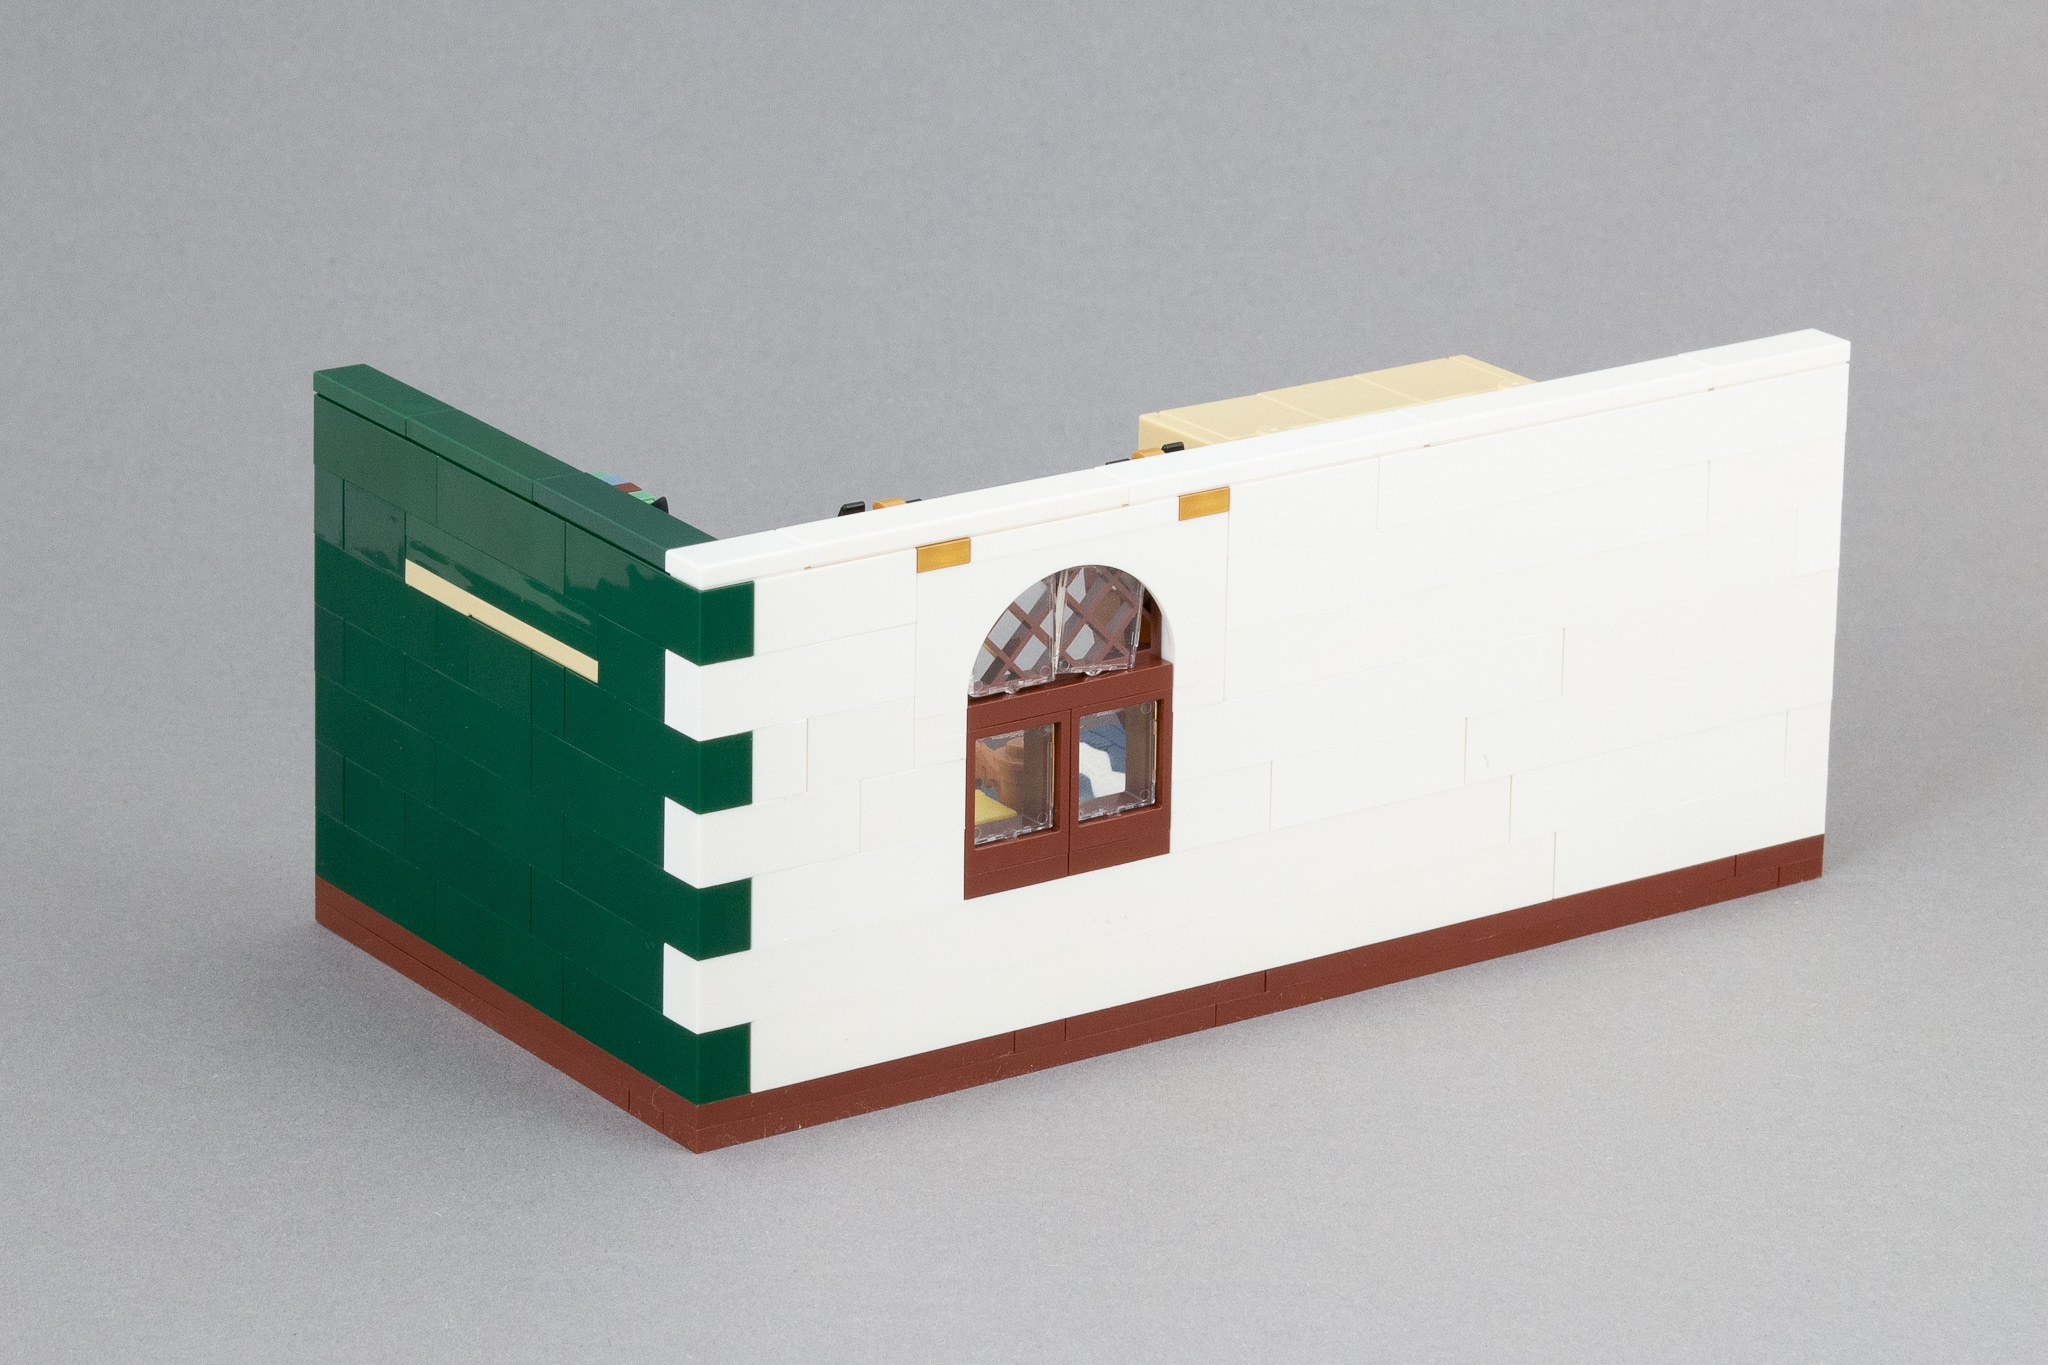 LEGO Schlafzimmer Moc (4)